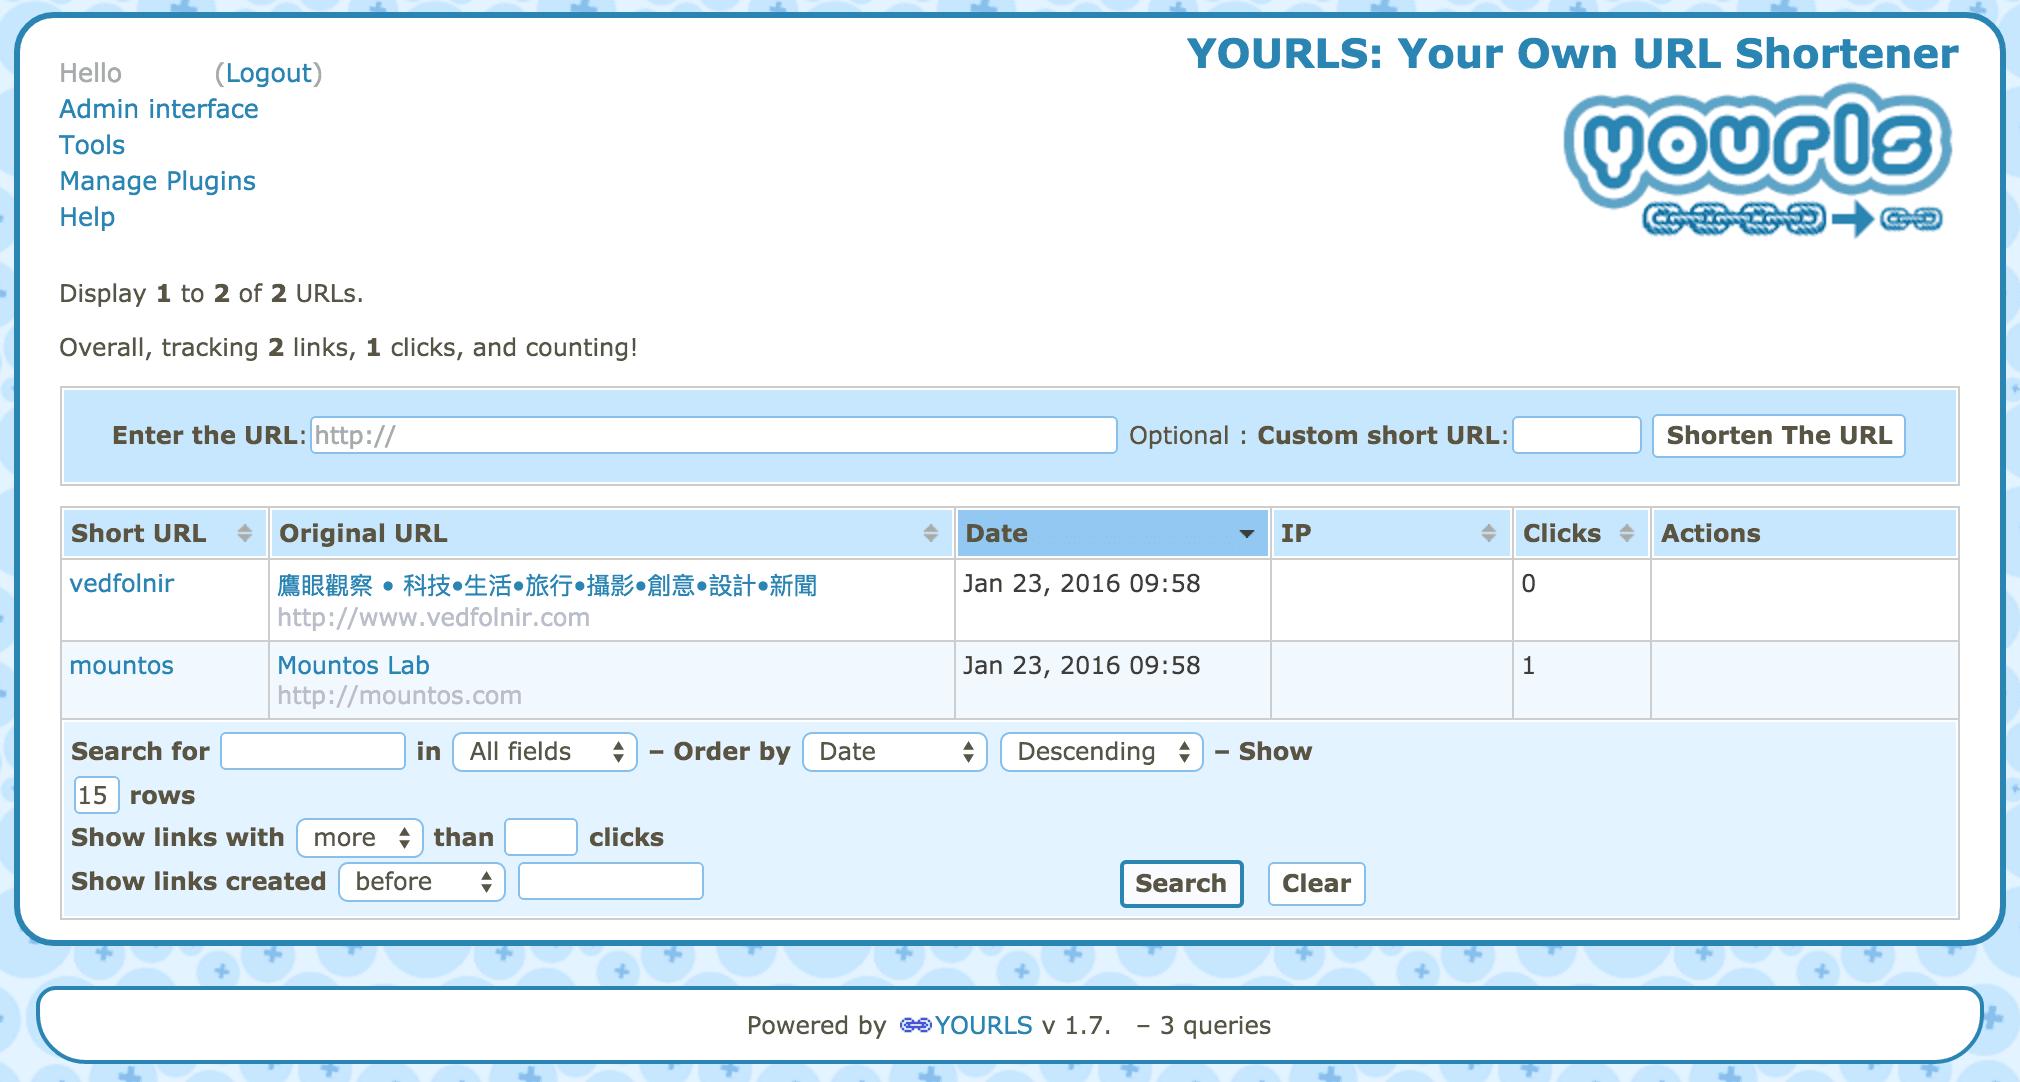 Shorten-Shrink-URL-Service-Interface-of-Yourls